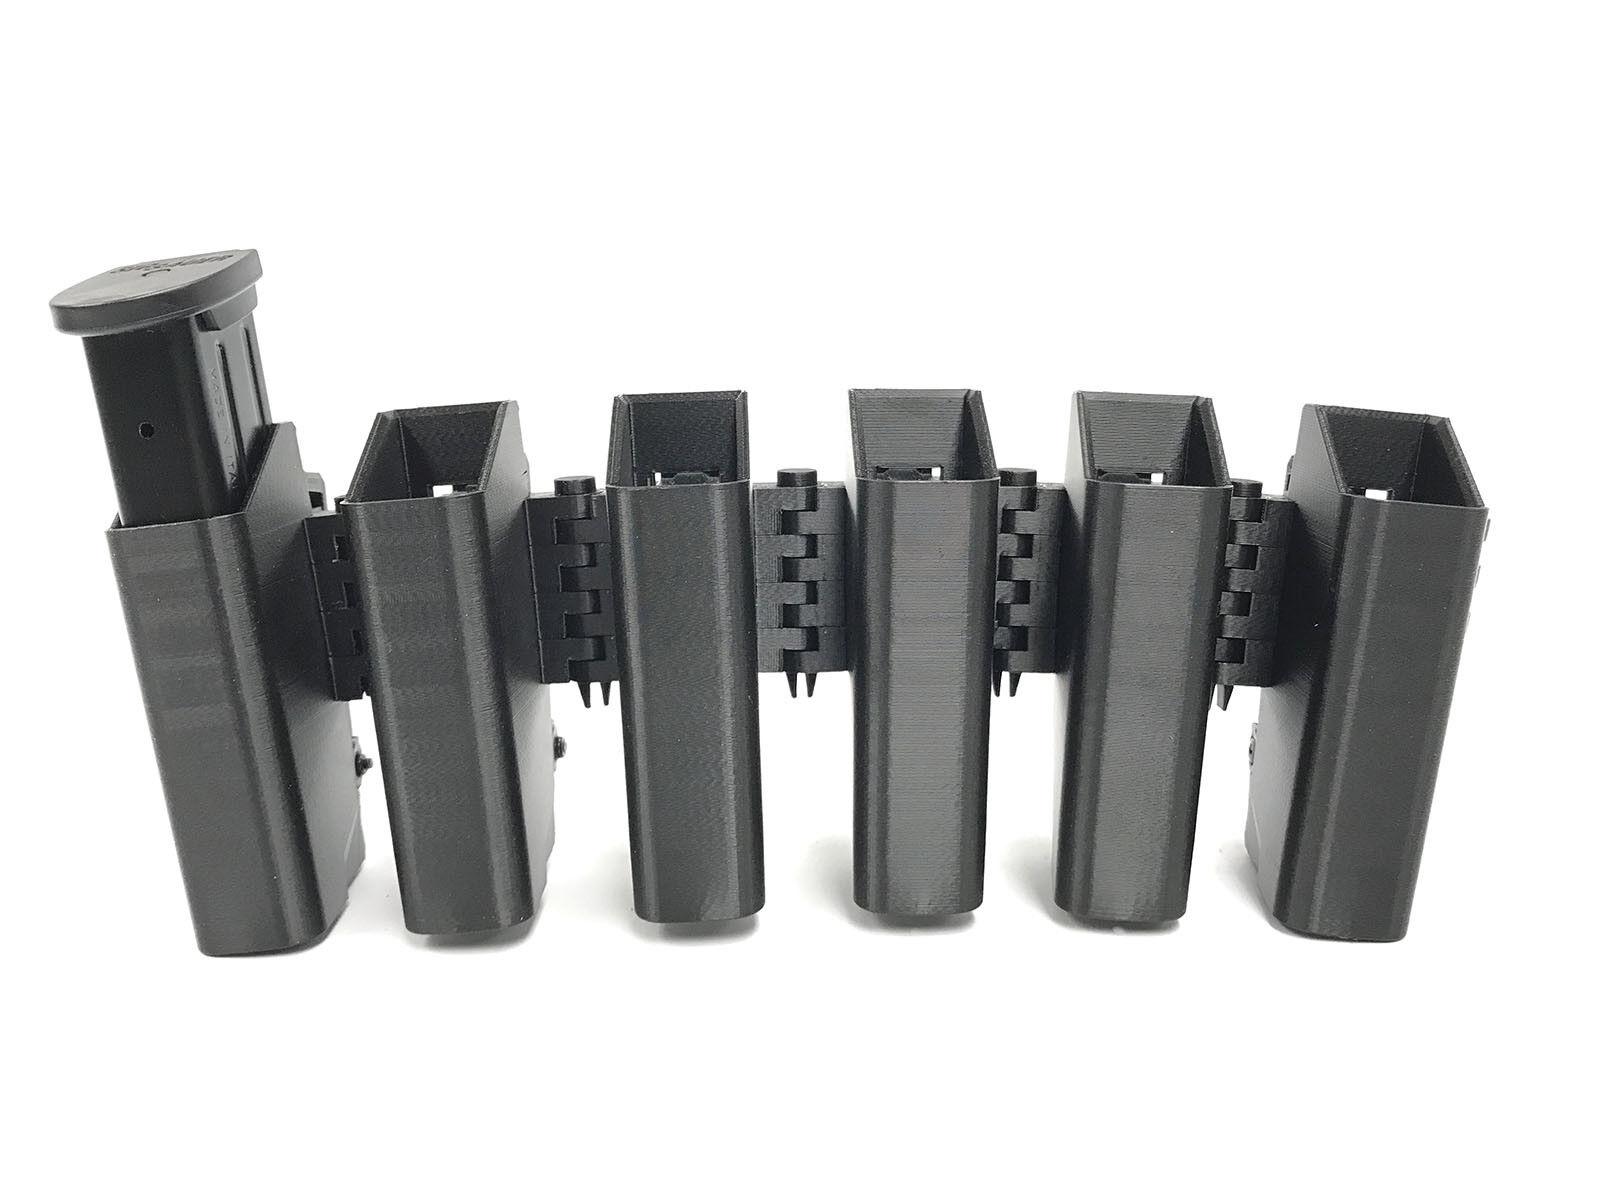 Eamp Enforcer-Sig Sauer 250, 320 Full 9 mm 10 RND seis bolsa del Mag - 0462-F